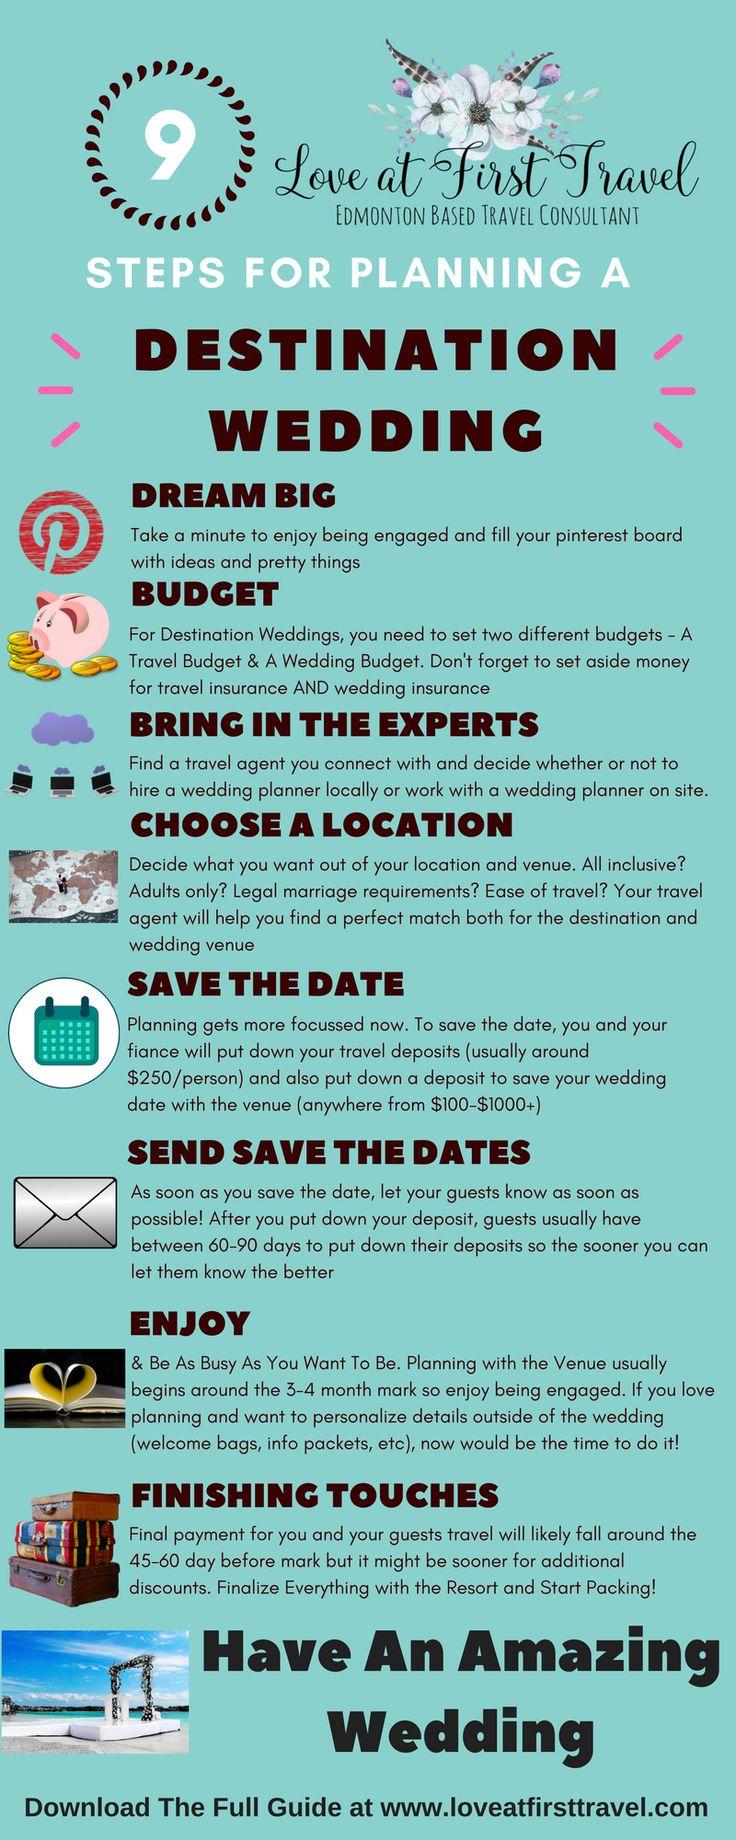 Destination Wedding Planning Checklist – Guide for Canadians Planning Destinatio…